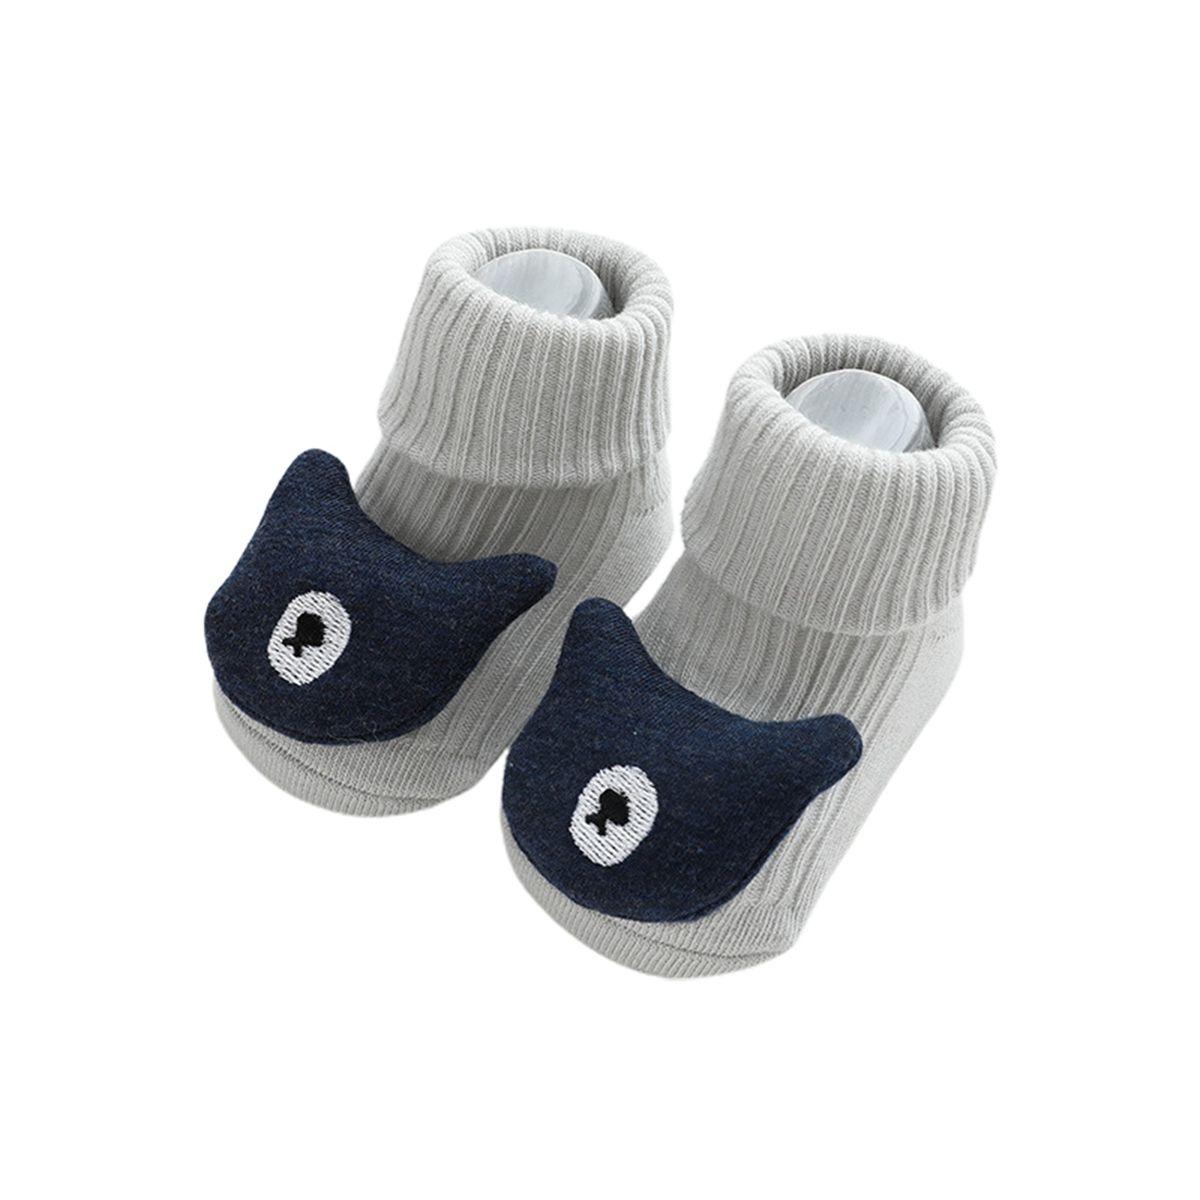 Baby Sockenschuhe Winter Dicke Baumwolle Tierstile Nette Babyboden Schuhe Anti-Rutsch Erste Wanderer 0-3 Jahre